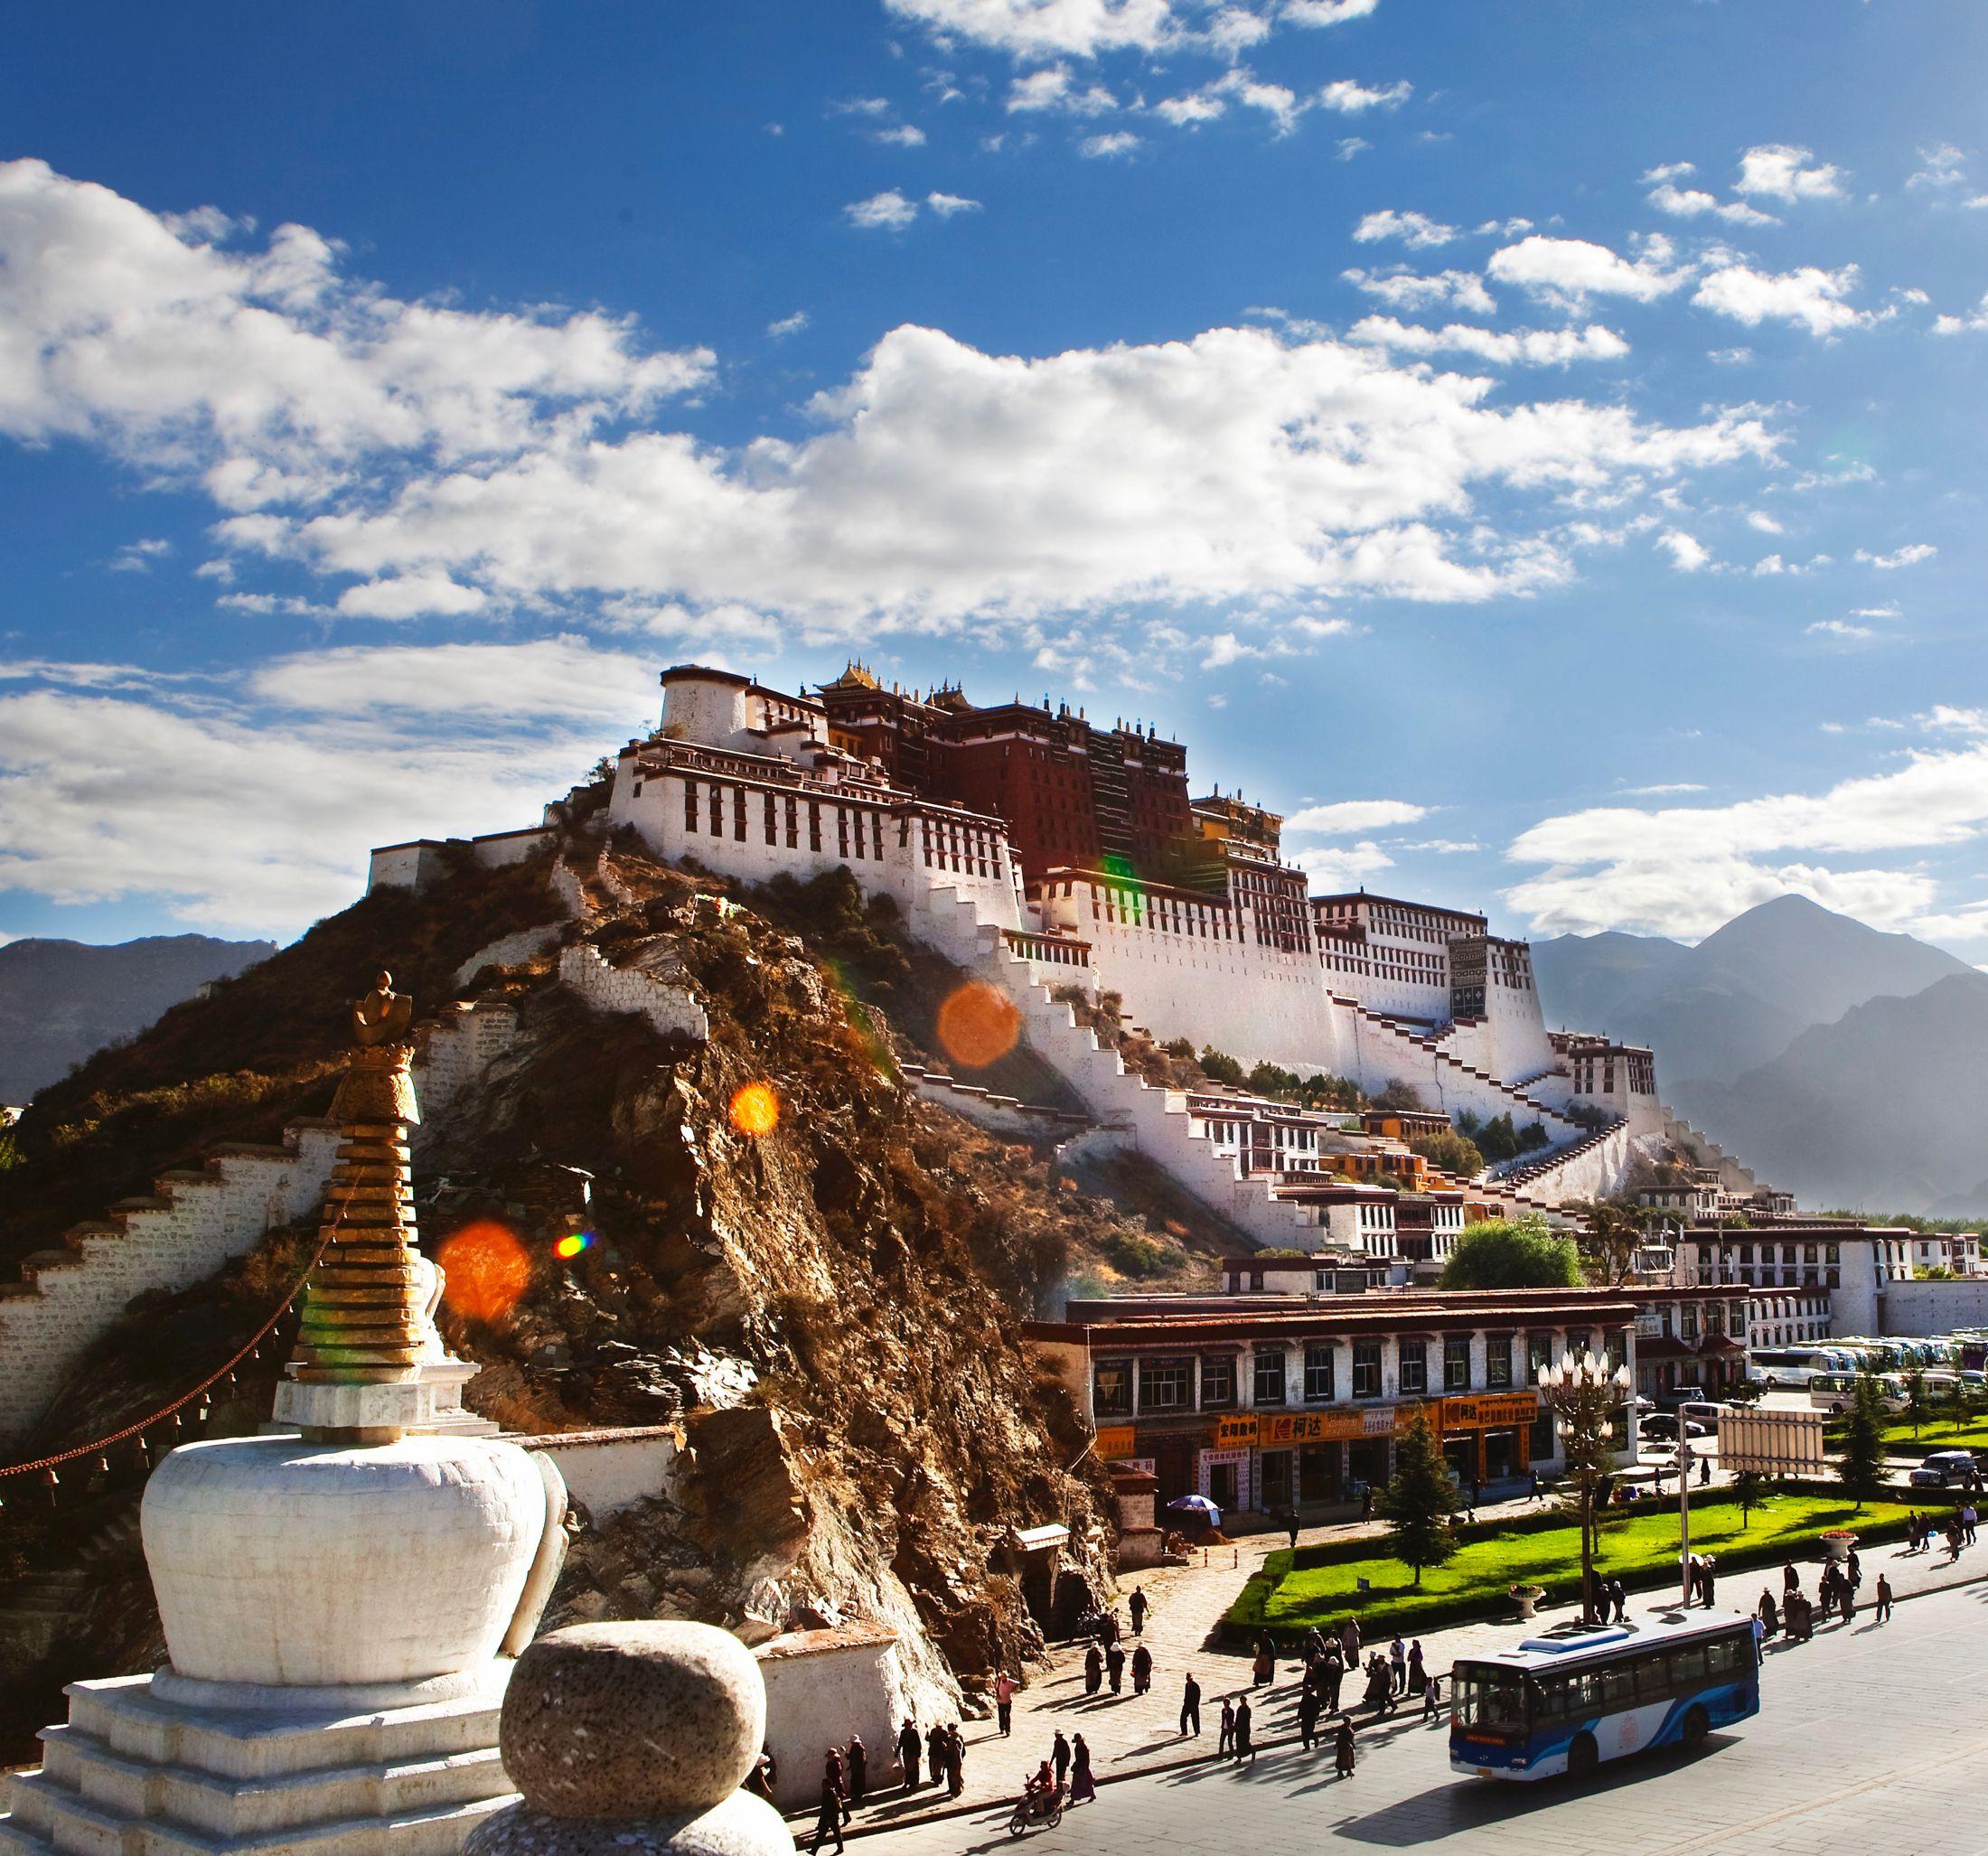 Dalai Lama's Potala Palace in Tibet